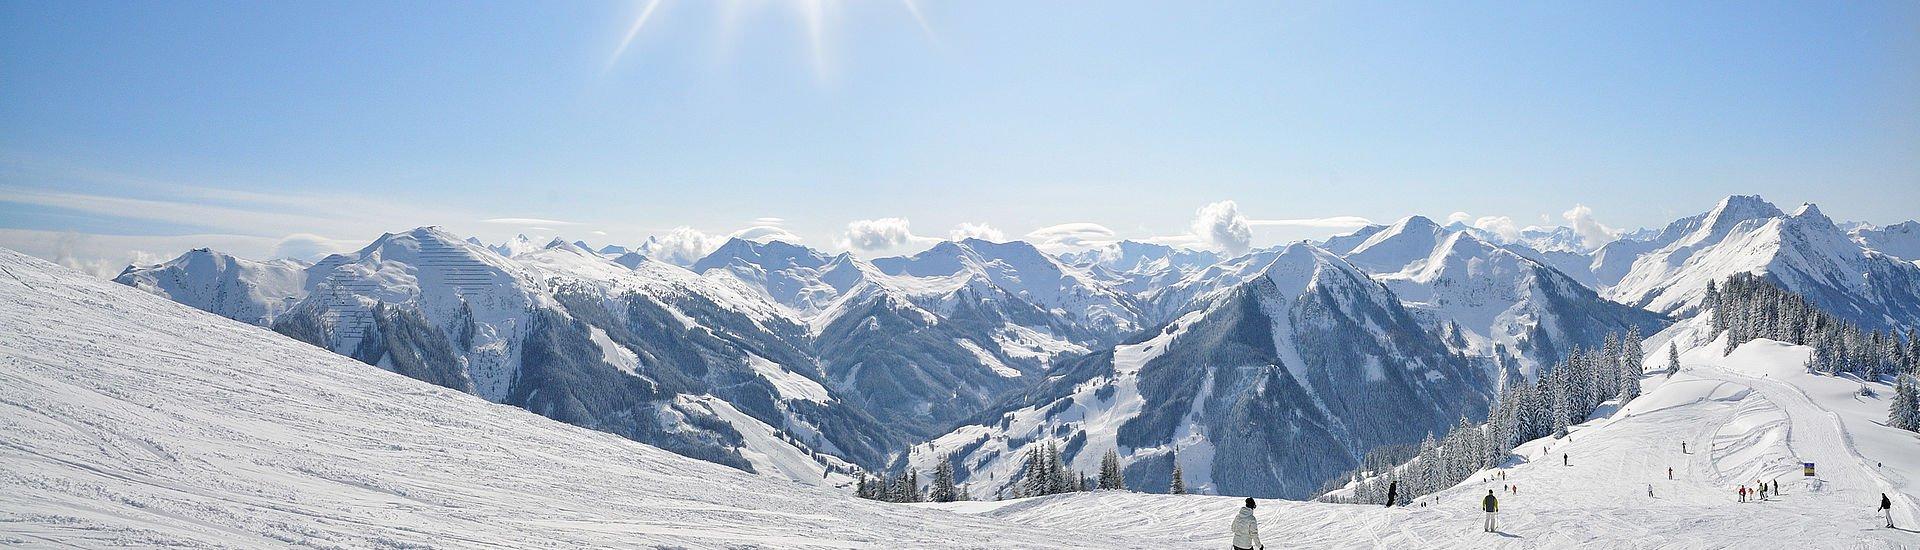 Panorama-Skifahren in Saalbach